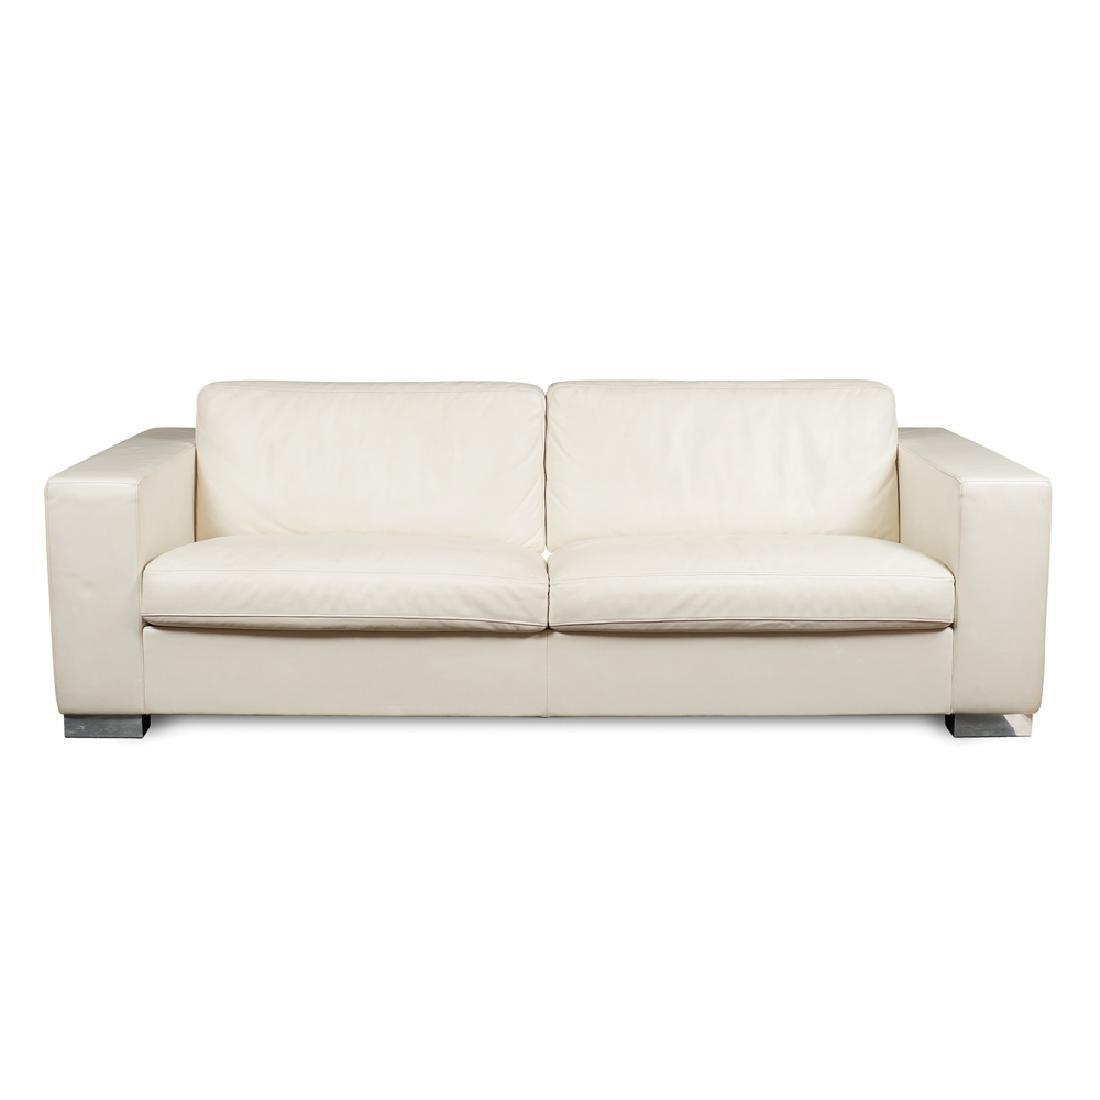 Frau Massimo model sofa Italy 20th century